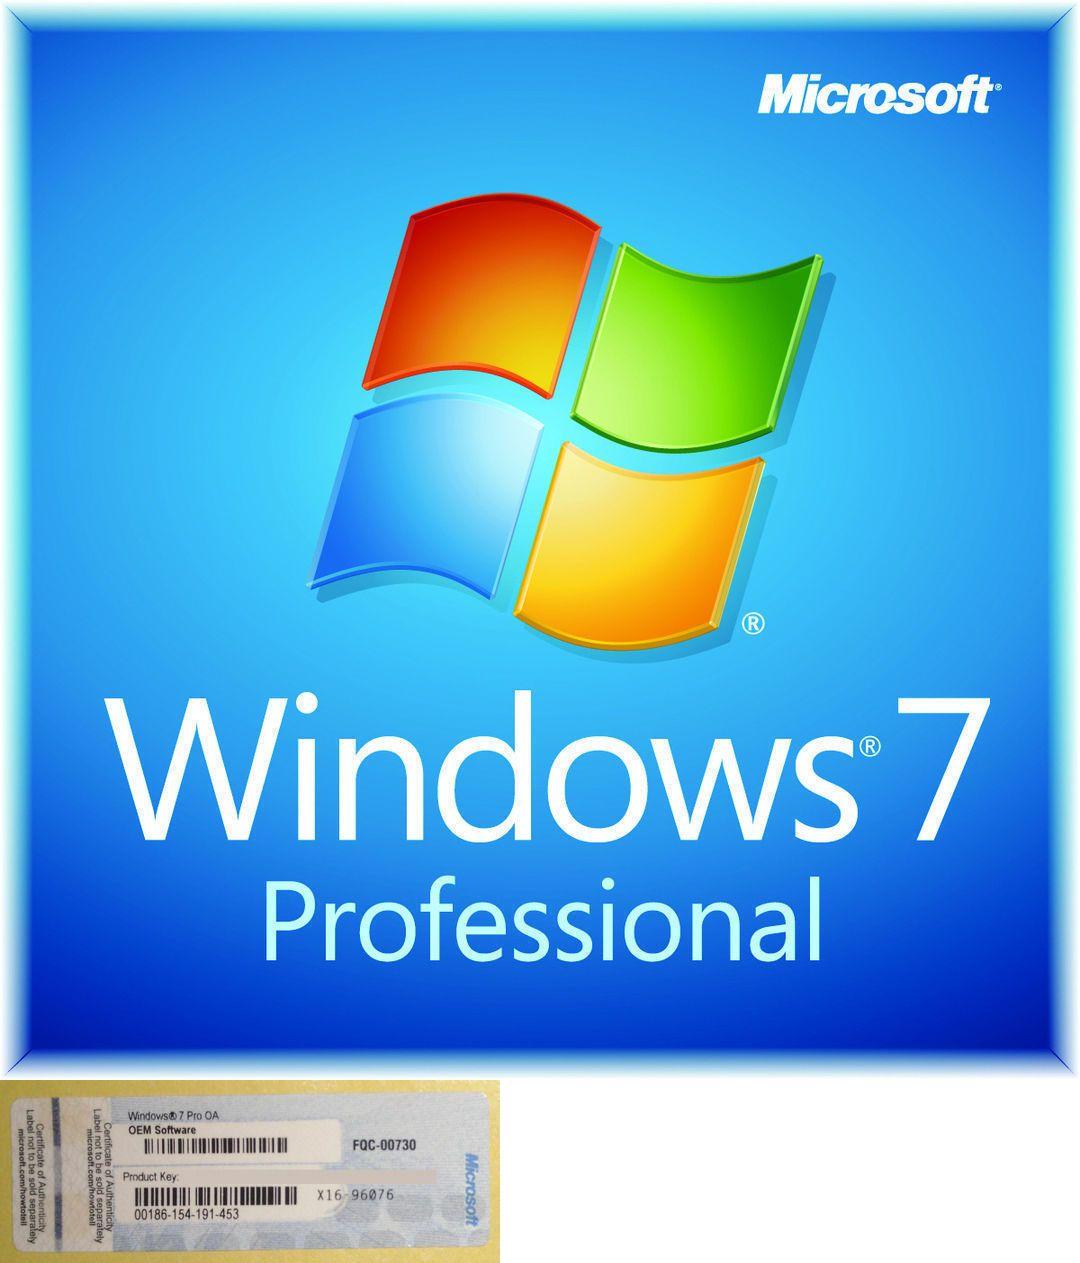 Windows 7 Best Buy